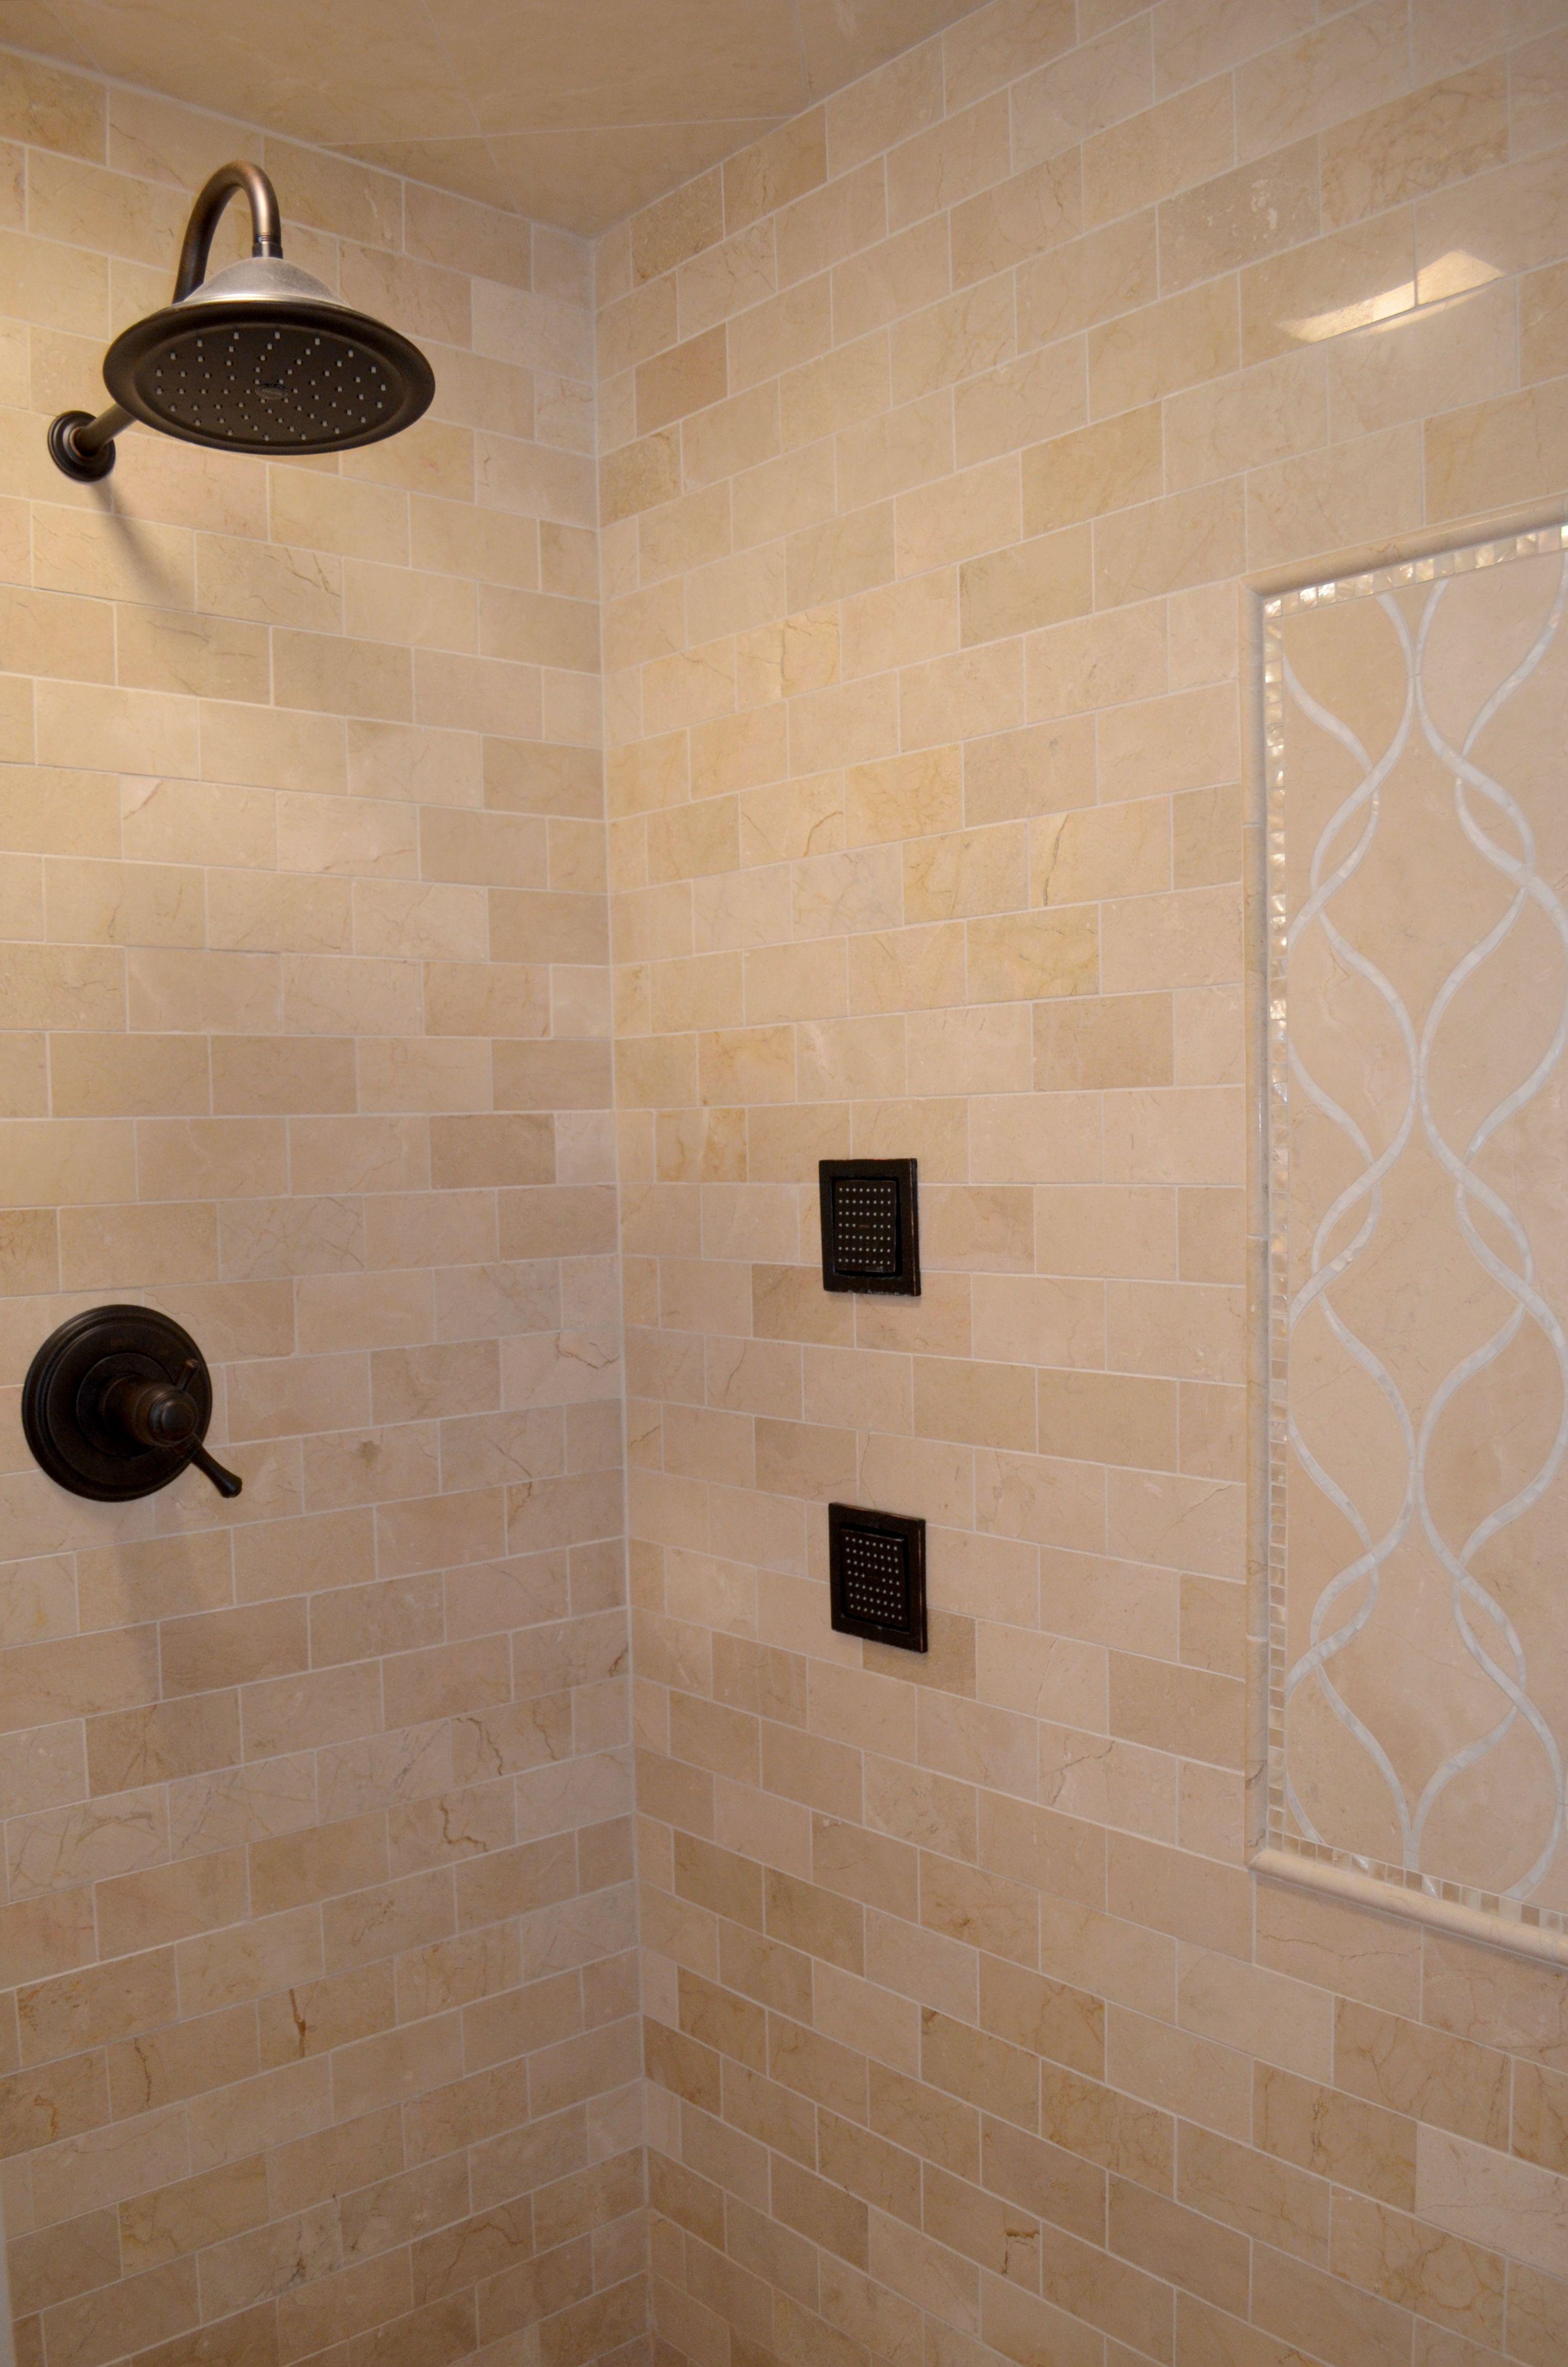 Walk In Master Shower Artistic Tile Crema Marfil Marble Tile Artistic Tile Claridges Stone And Shell Tile Mothe Shower Tile Neo Angle Shower Master Shower